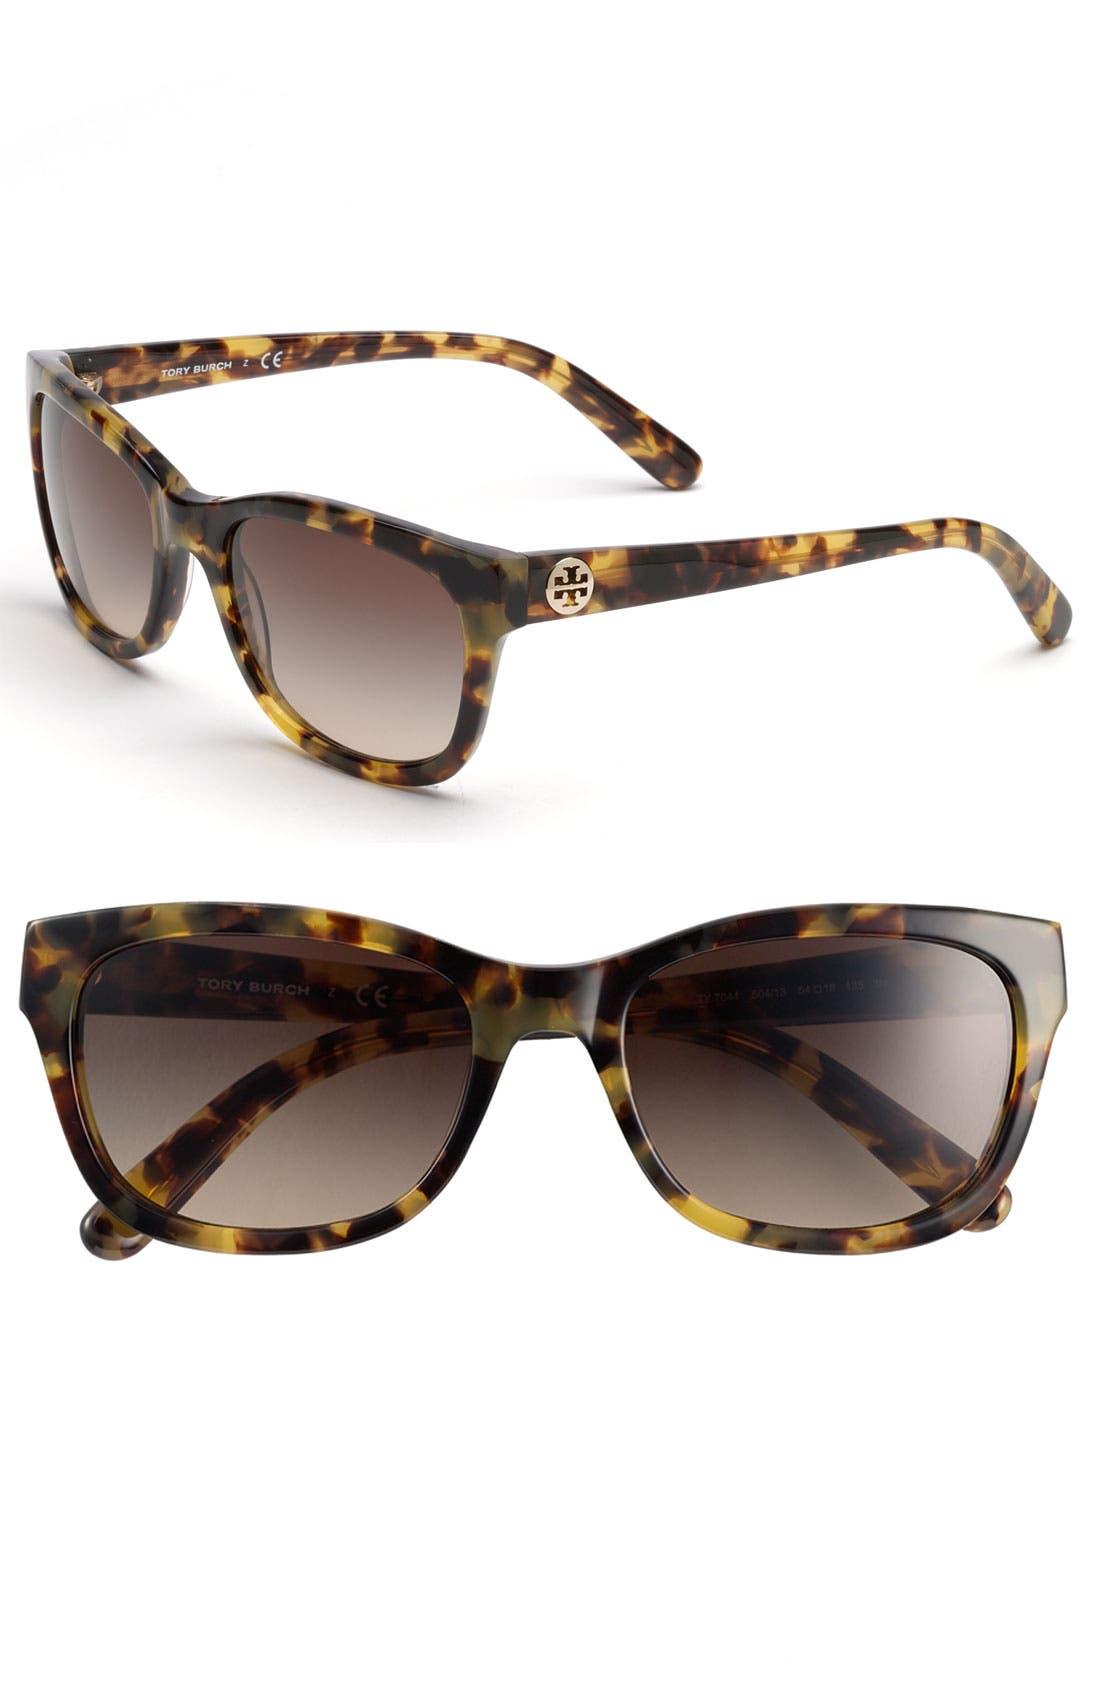 Main Image - Tory Burch 54mm Sunglasses